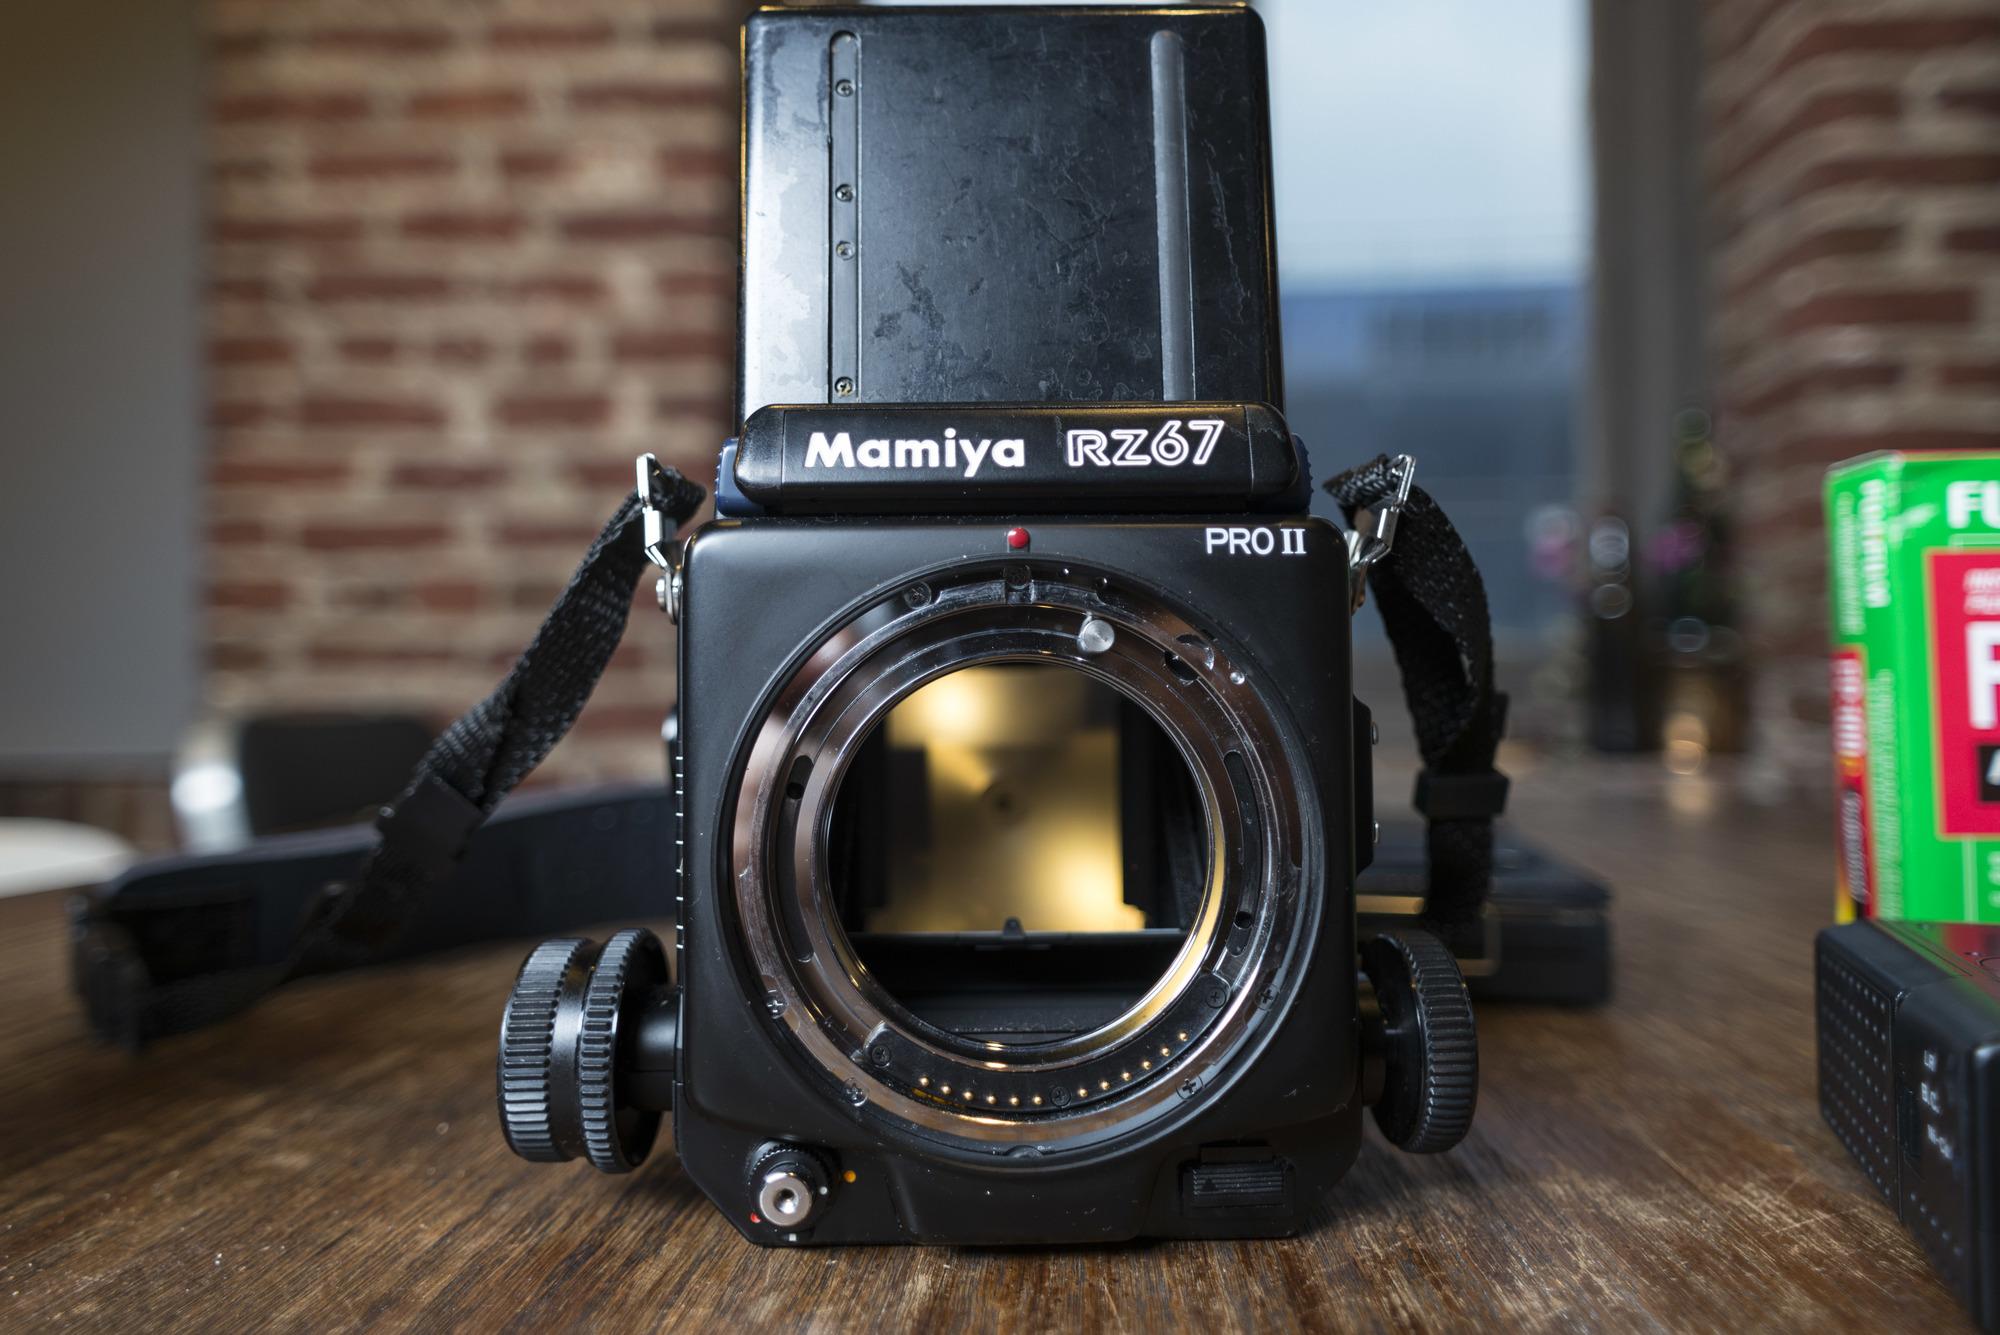 Sold: Mamiya RZ67 Pro II Kit + Lenses - FM Forums